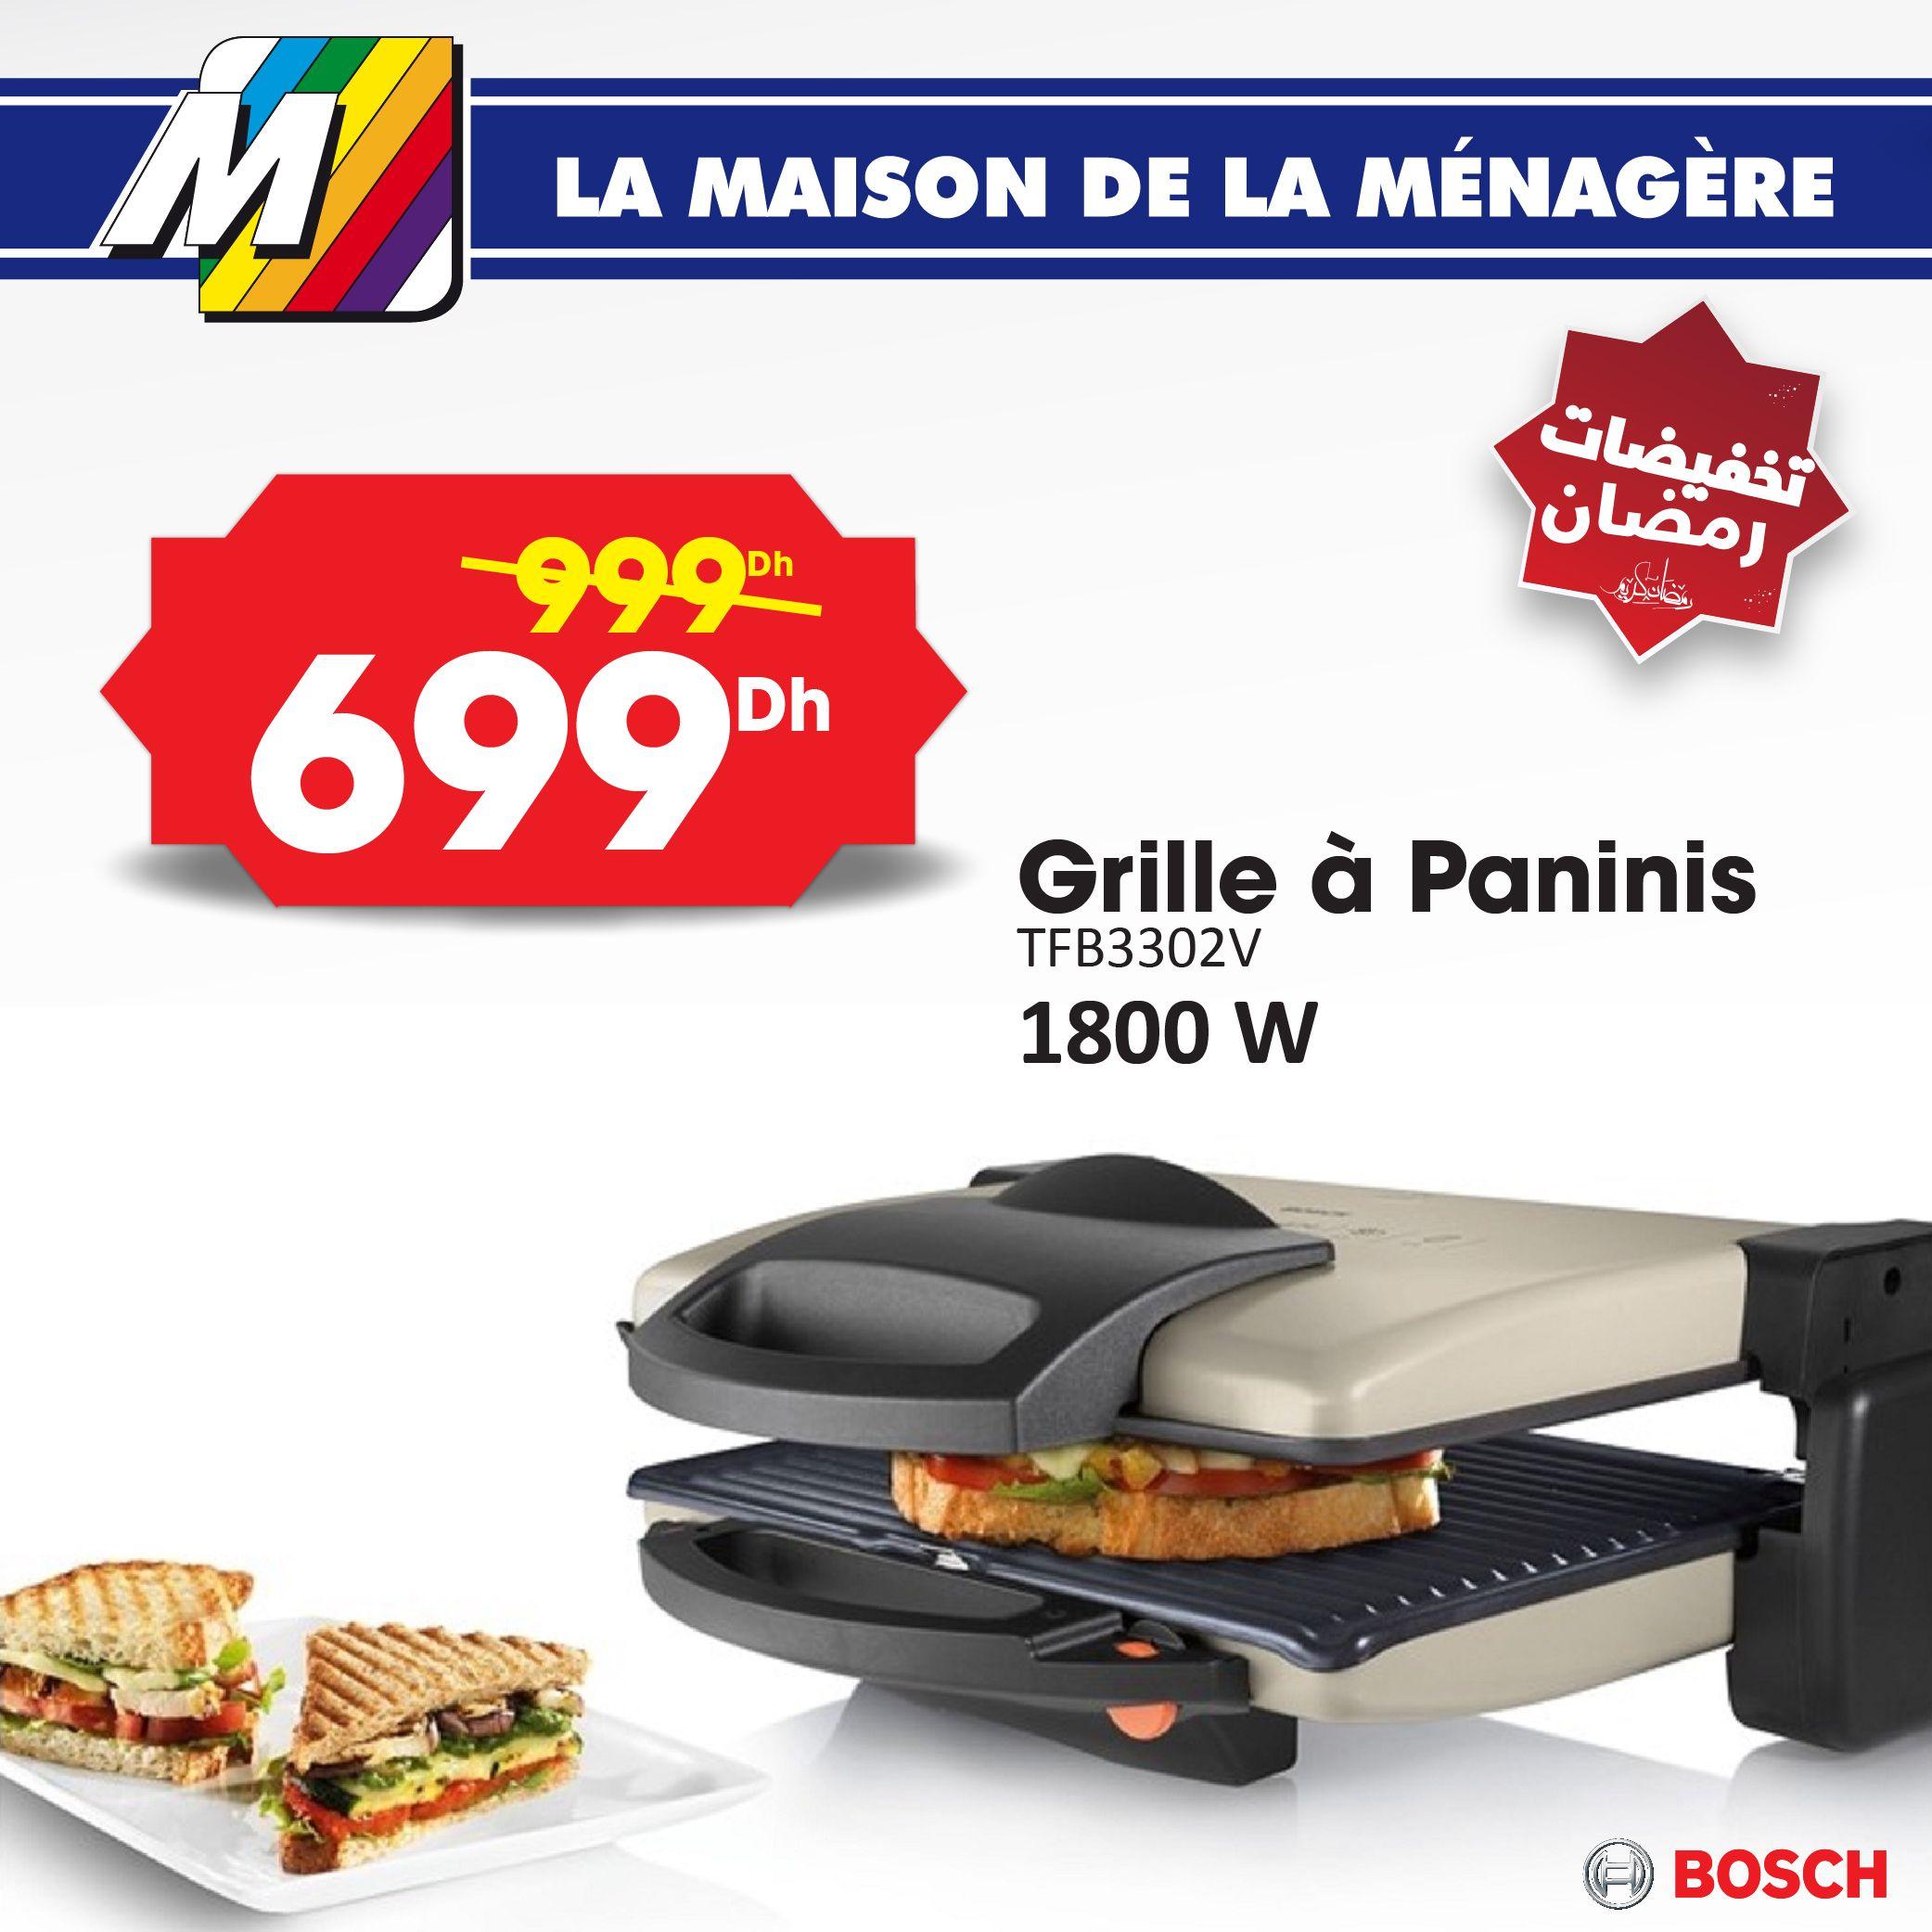 Grill Panini Bosch Sandwich Panini Maison Bosch Et Grille